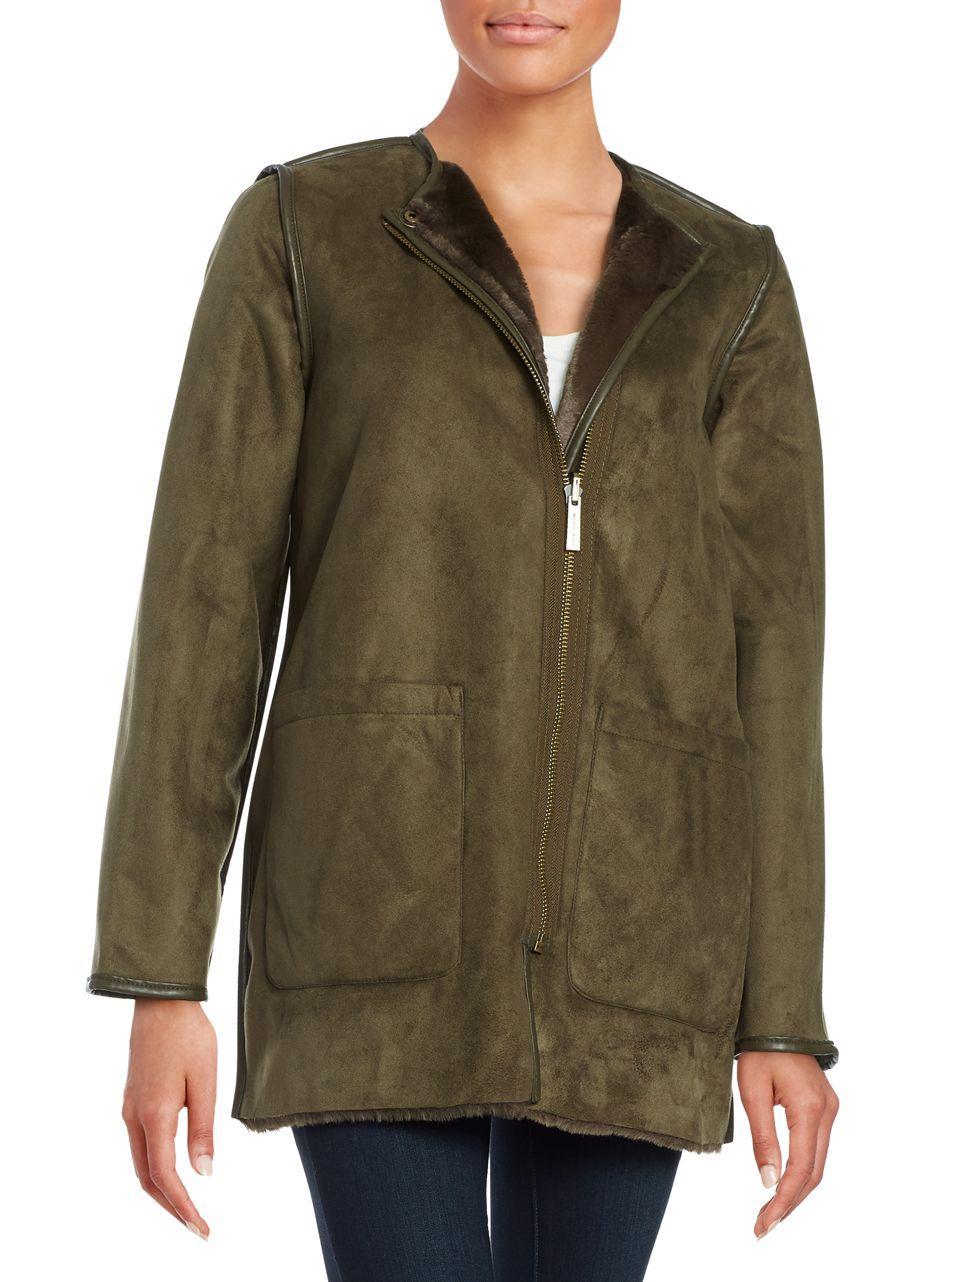 0ae491c10f8 Michael kors Reversible Faux Fur Jacket in Green